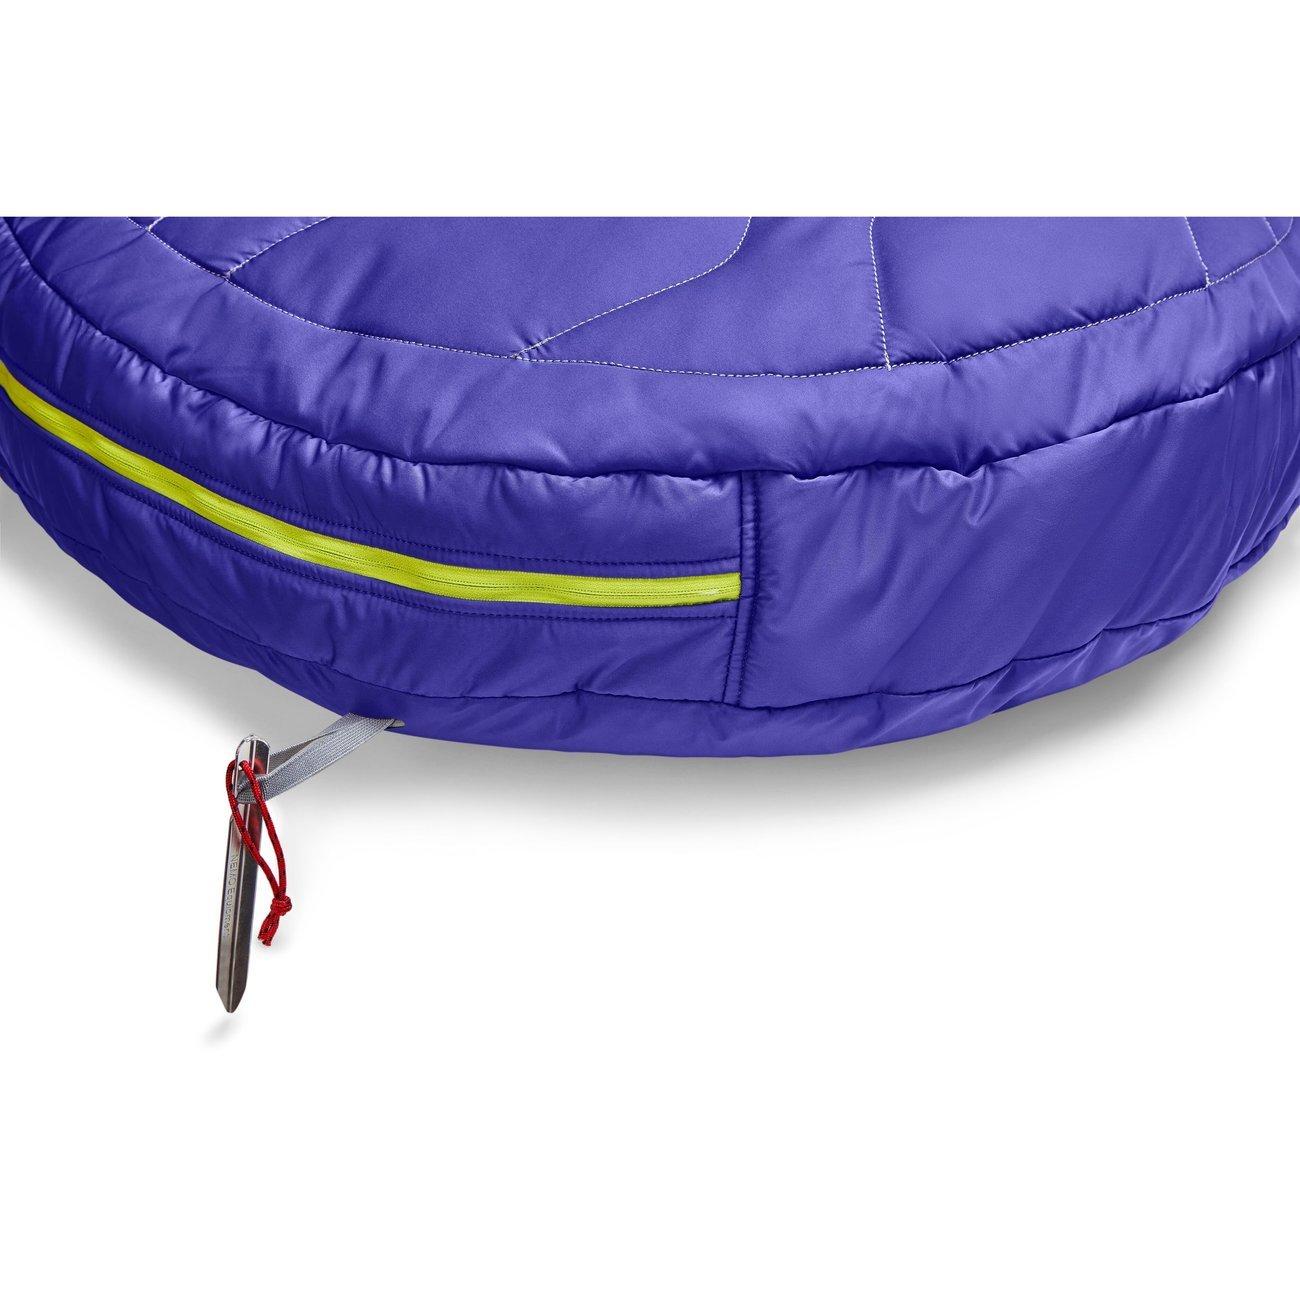 Ruffwear Highlands Sleeping Bag™ Schlafsack für Hunde, Bild 15